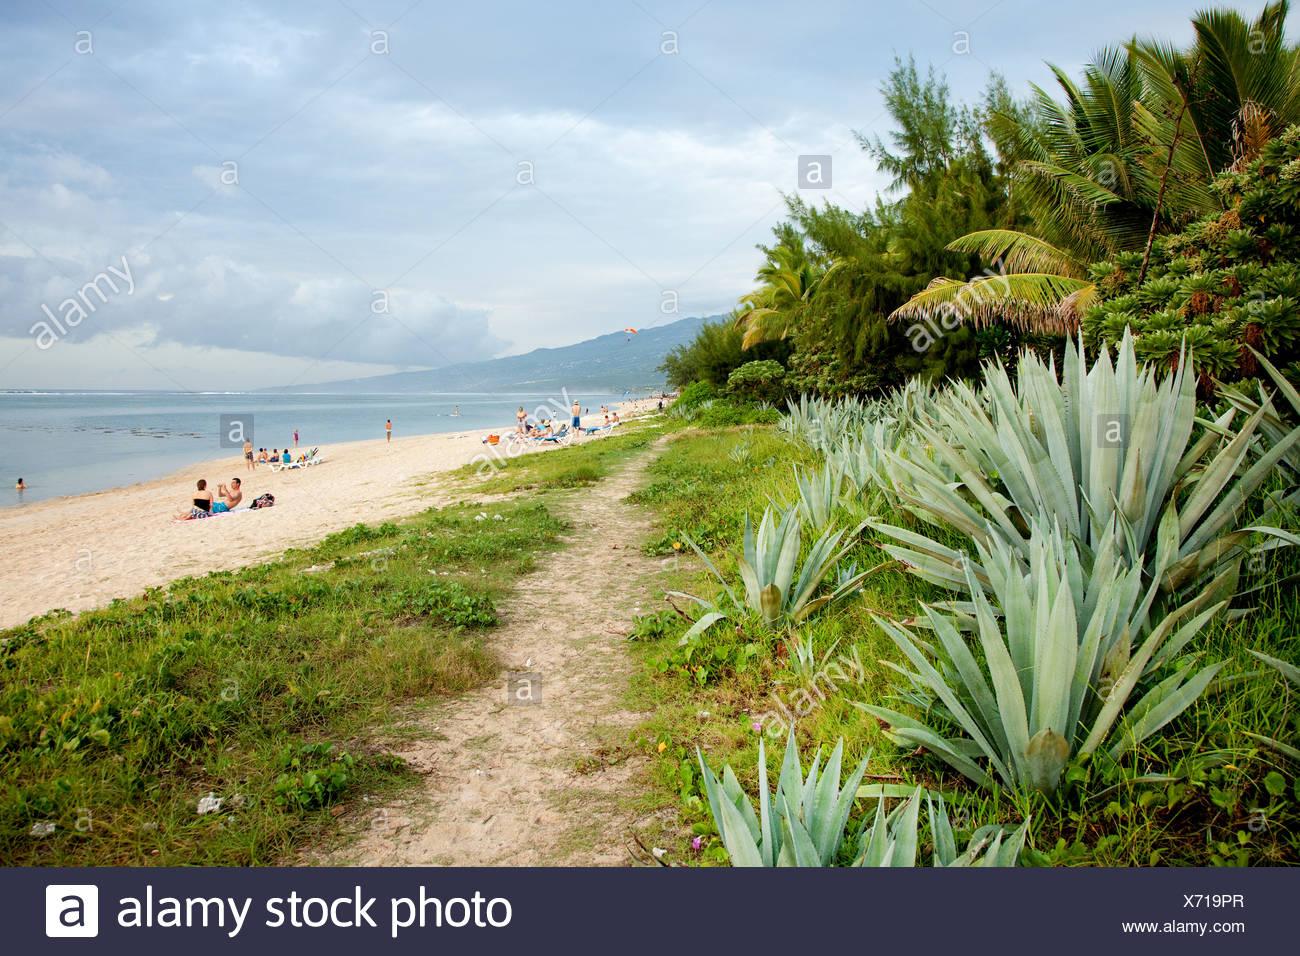 Beach at Saline-les-Bains, La Reunion island, Indian Ocean - Stock Image